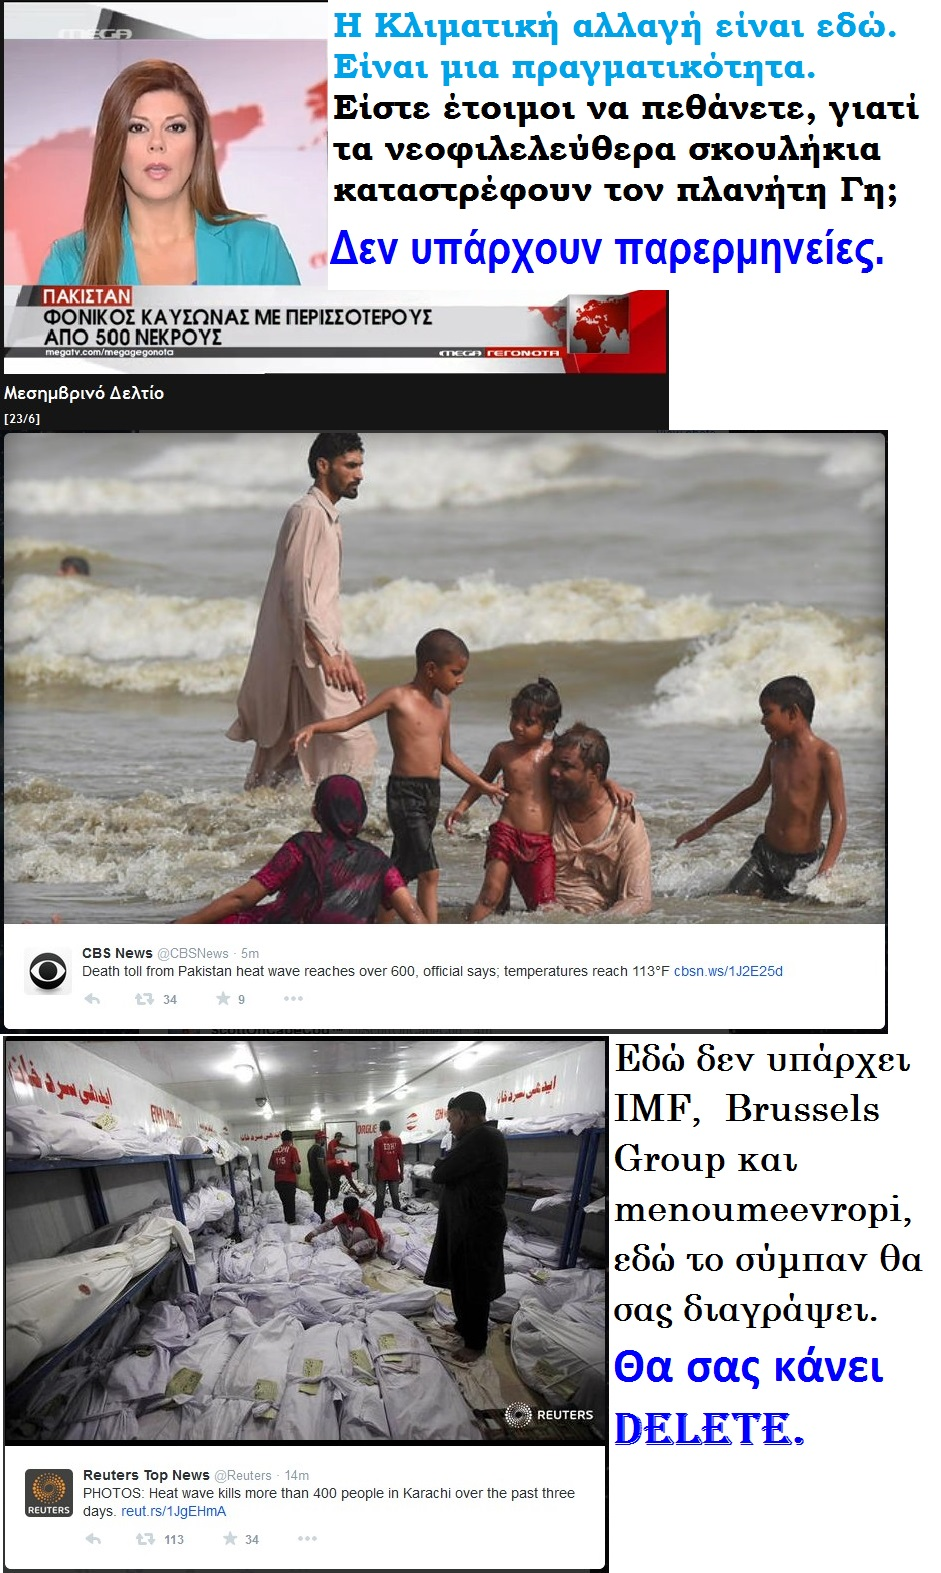 PAKISTAN HEAT WAVE DEAD KARACHI 01 250615